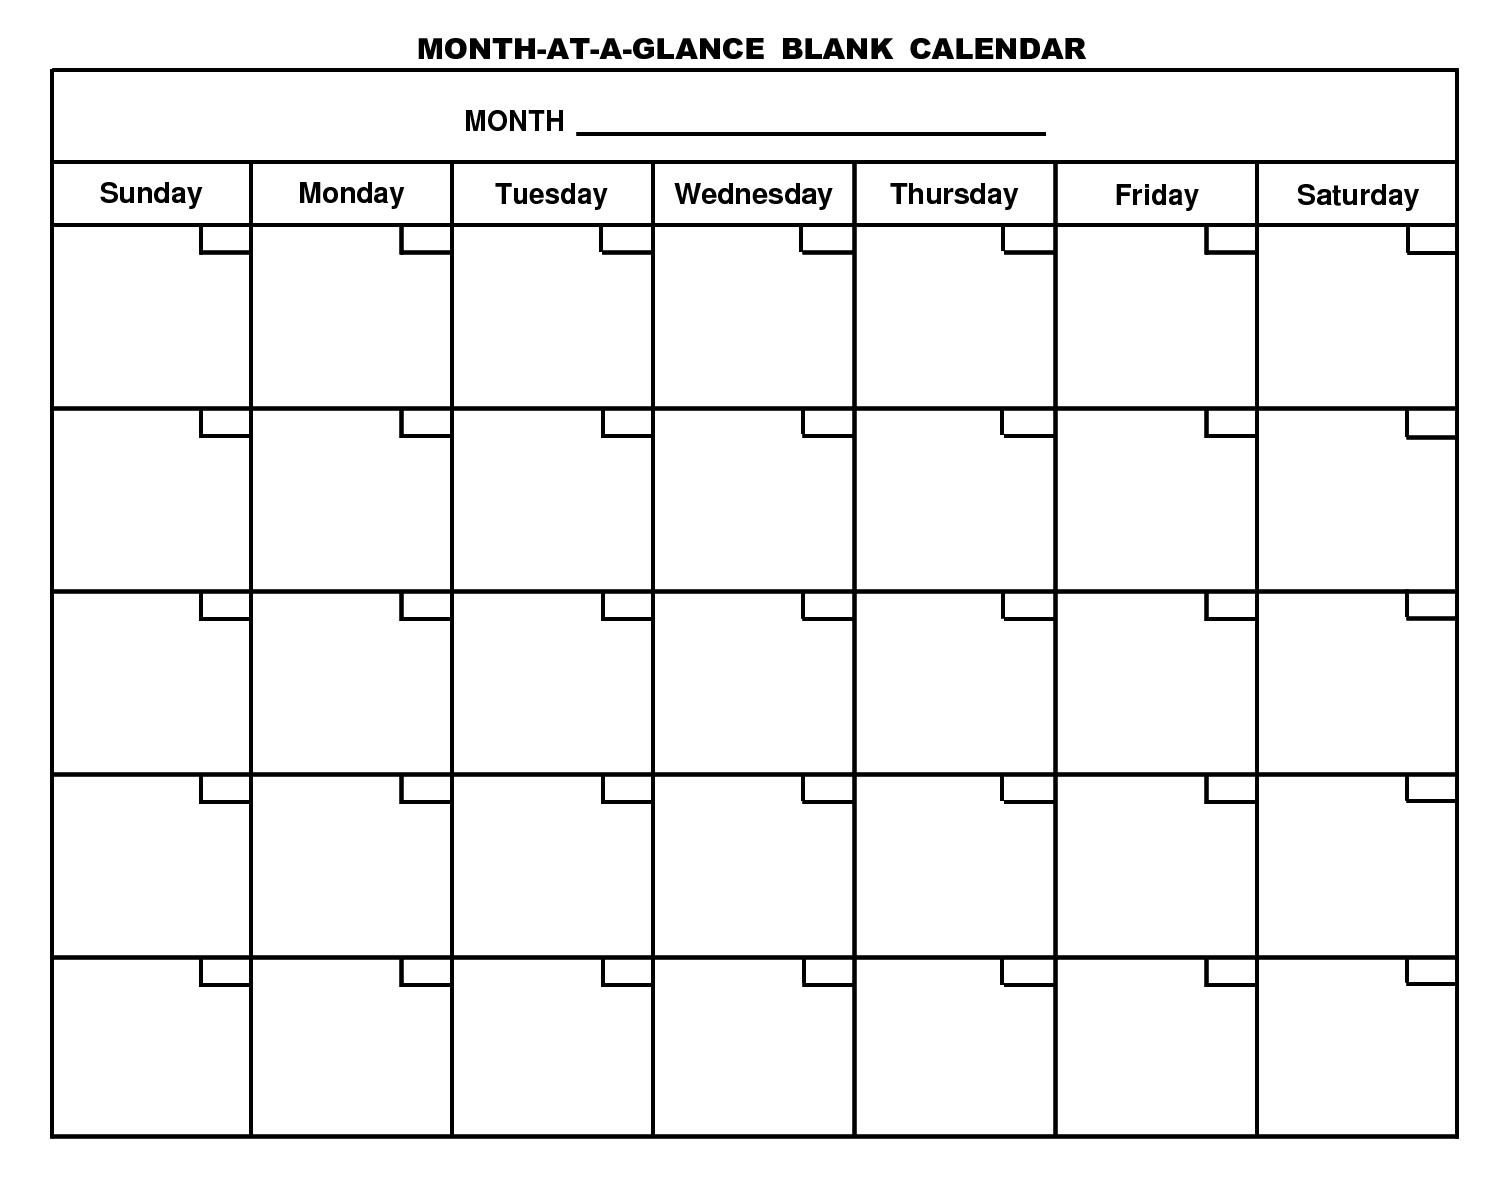 Blank Calendar Template Free Printable Blank Calendars by Vertex42